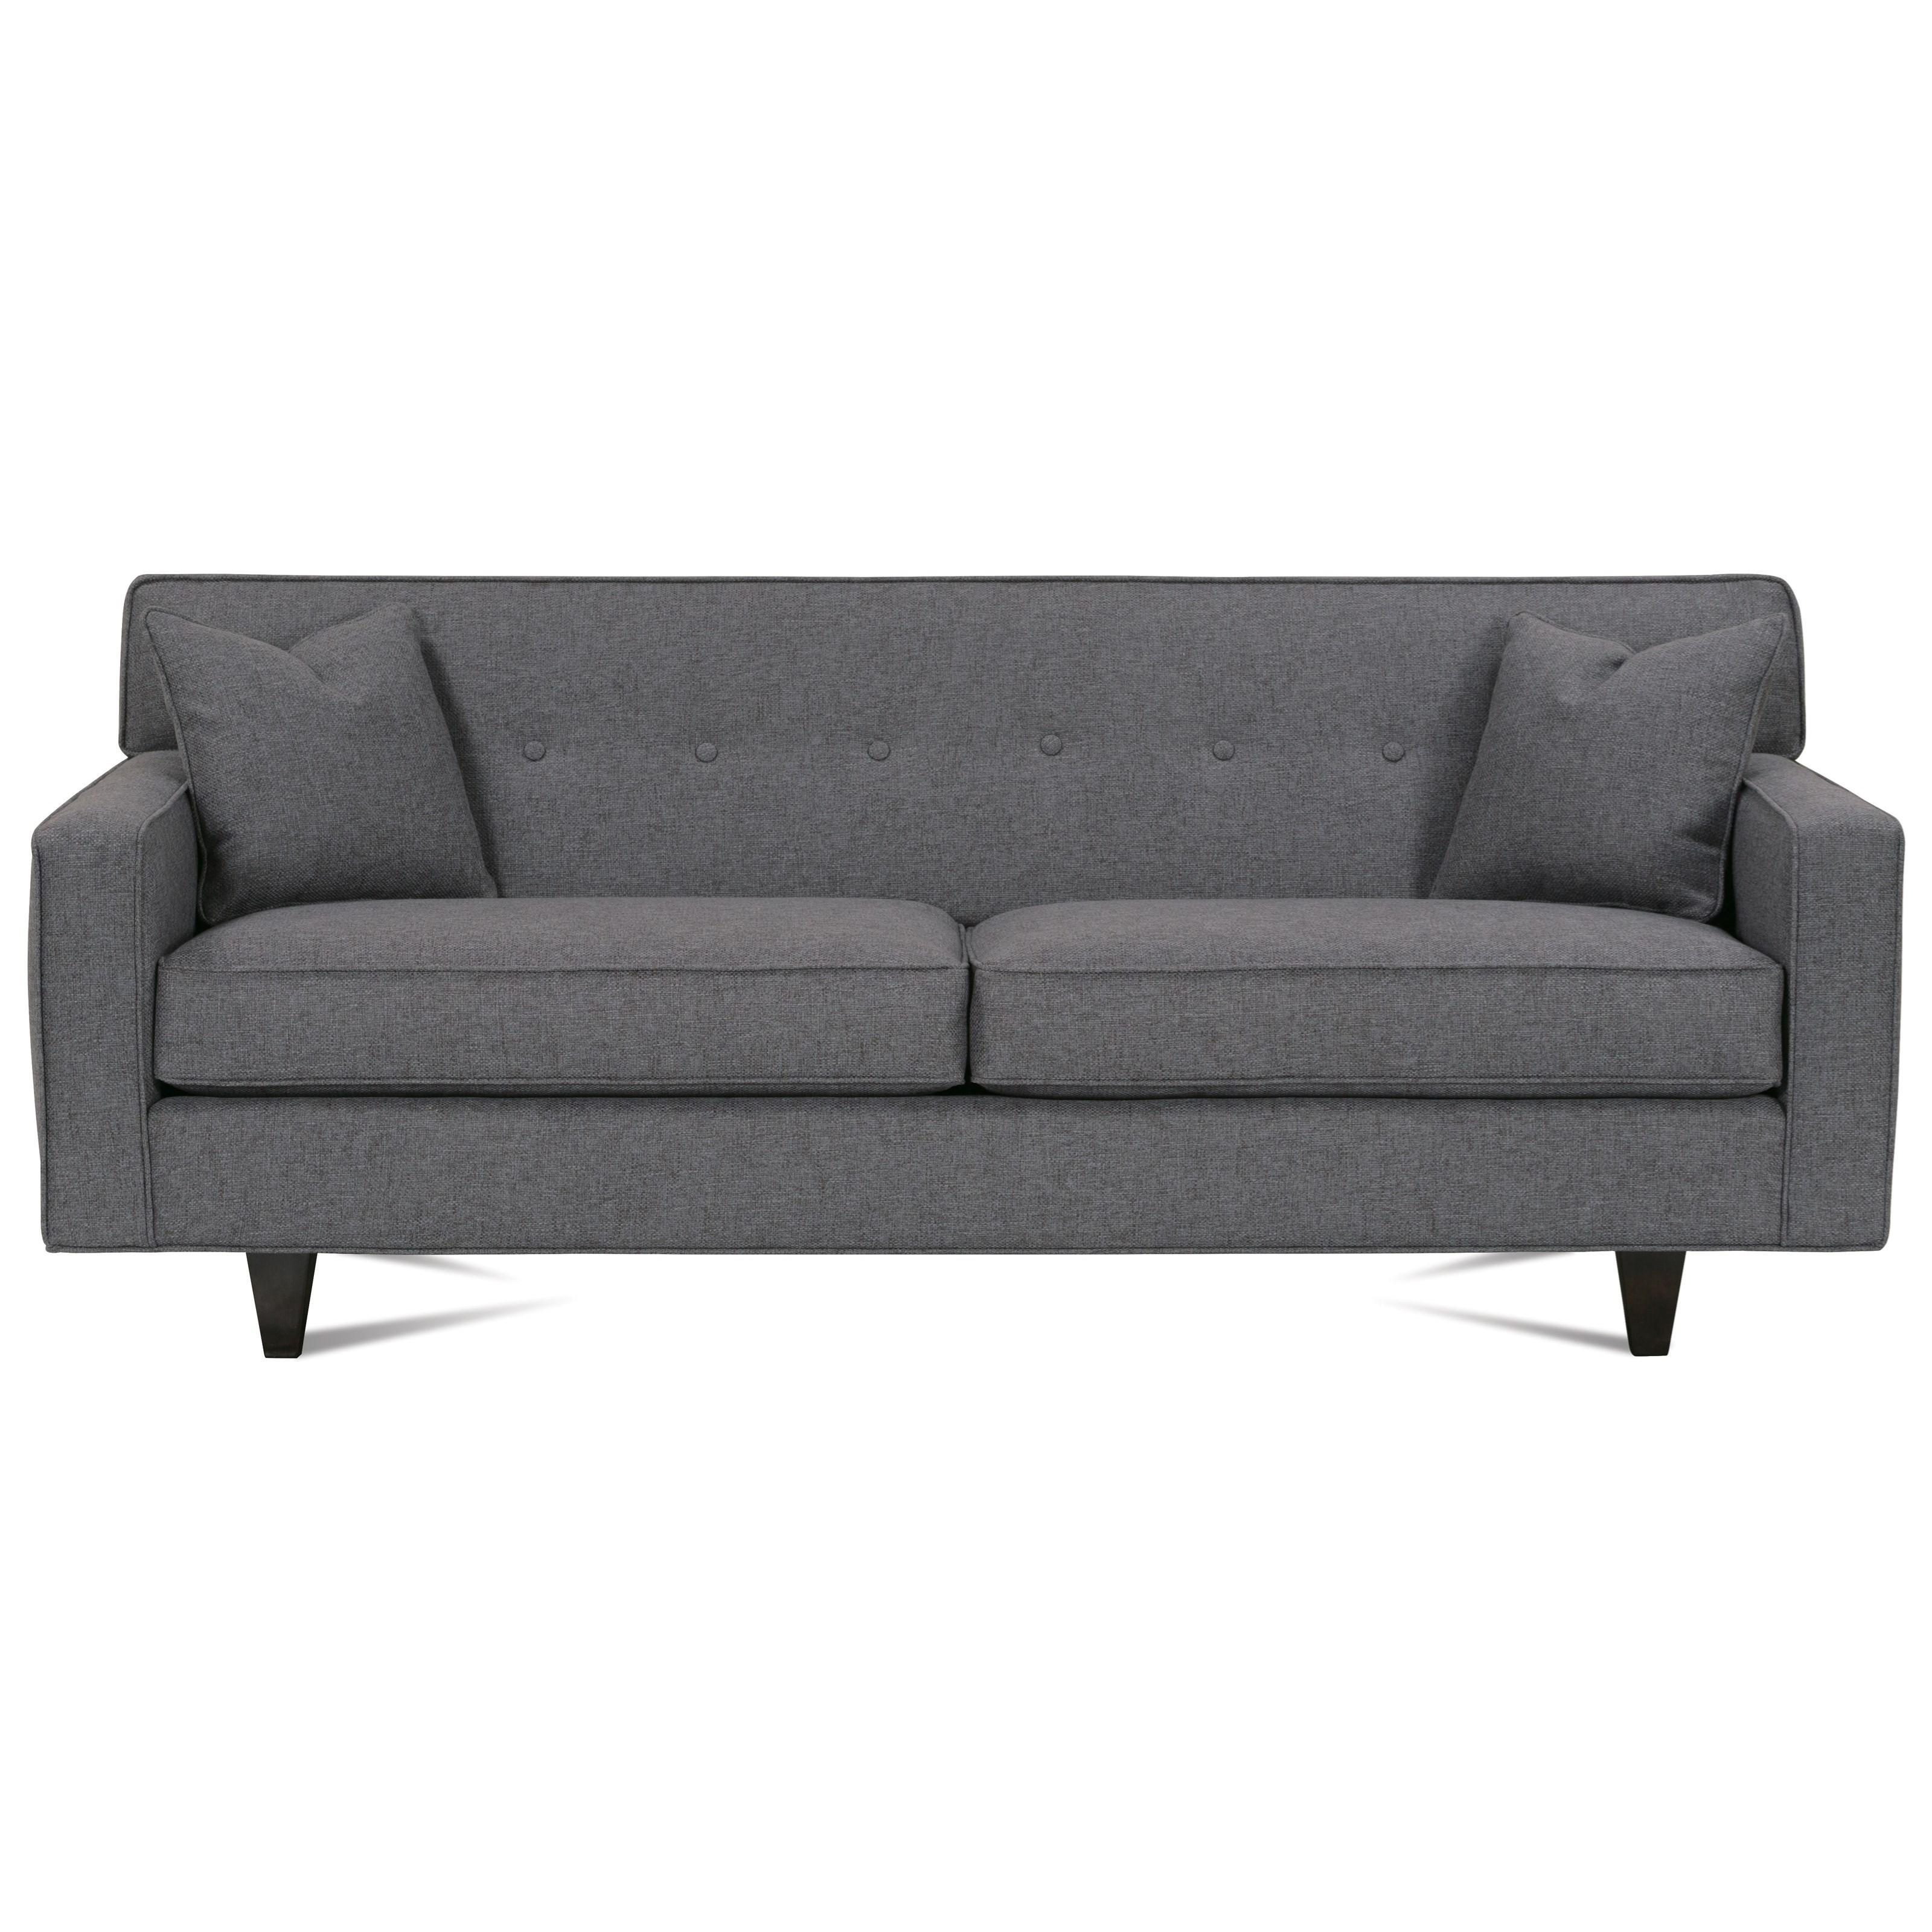 "Dorset 75"" 2-Cushion Sofa by Rowe at Saugerties Furniture Mart"